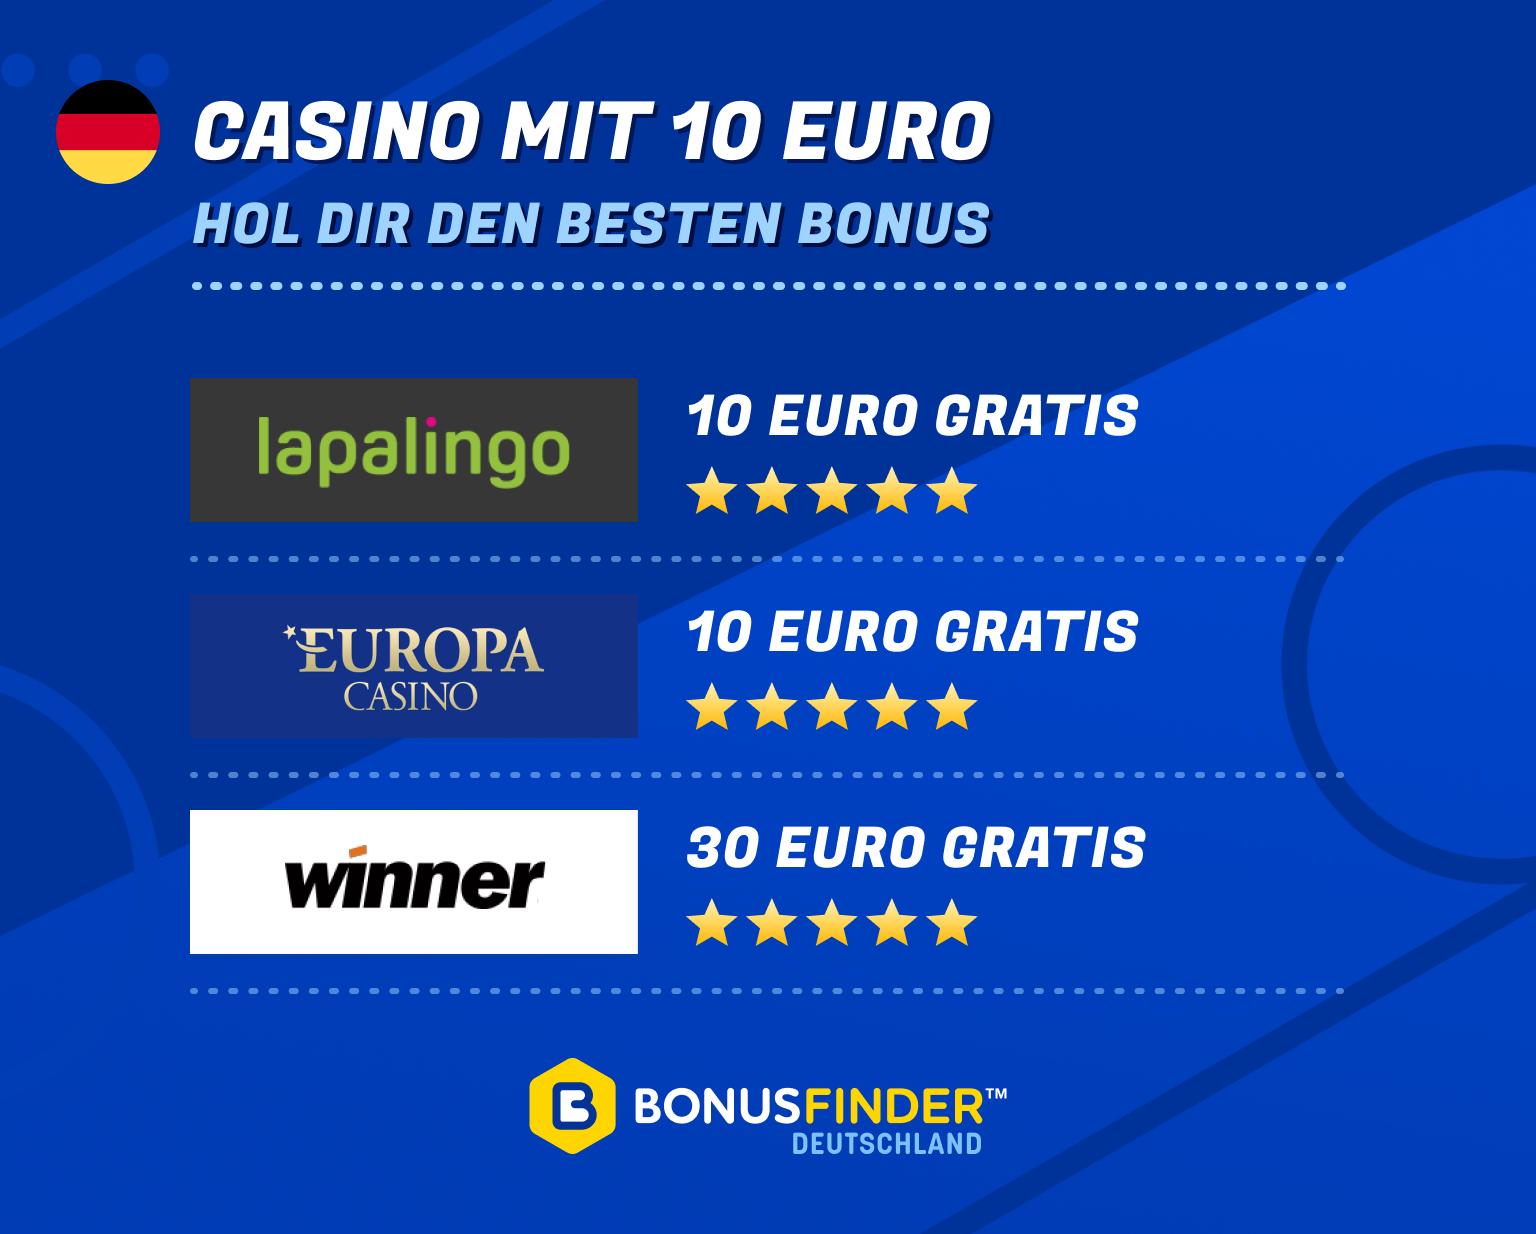 casino mit 10 euro